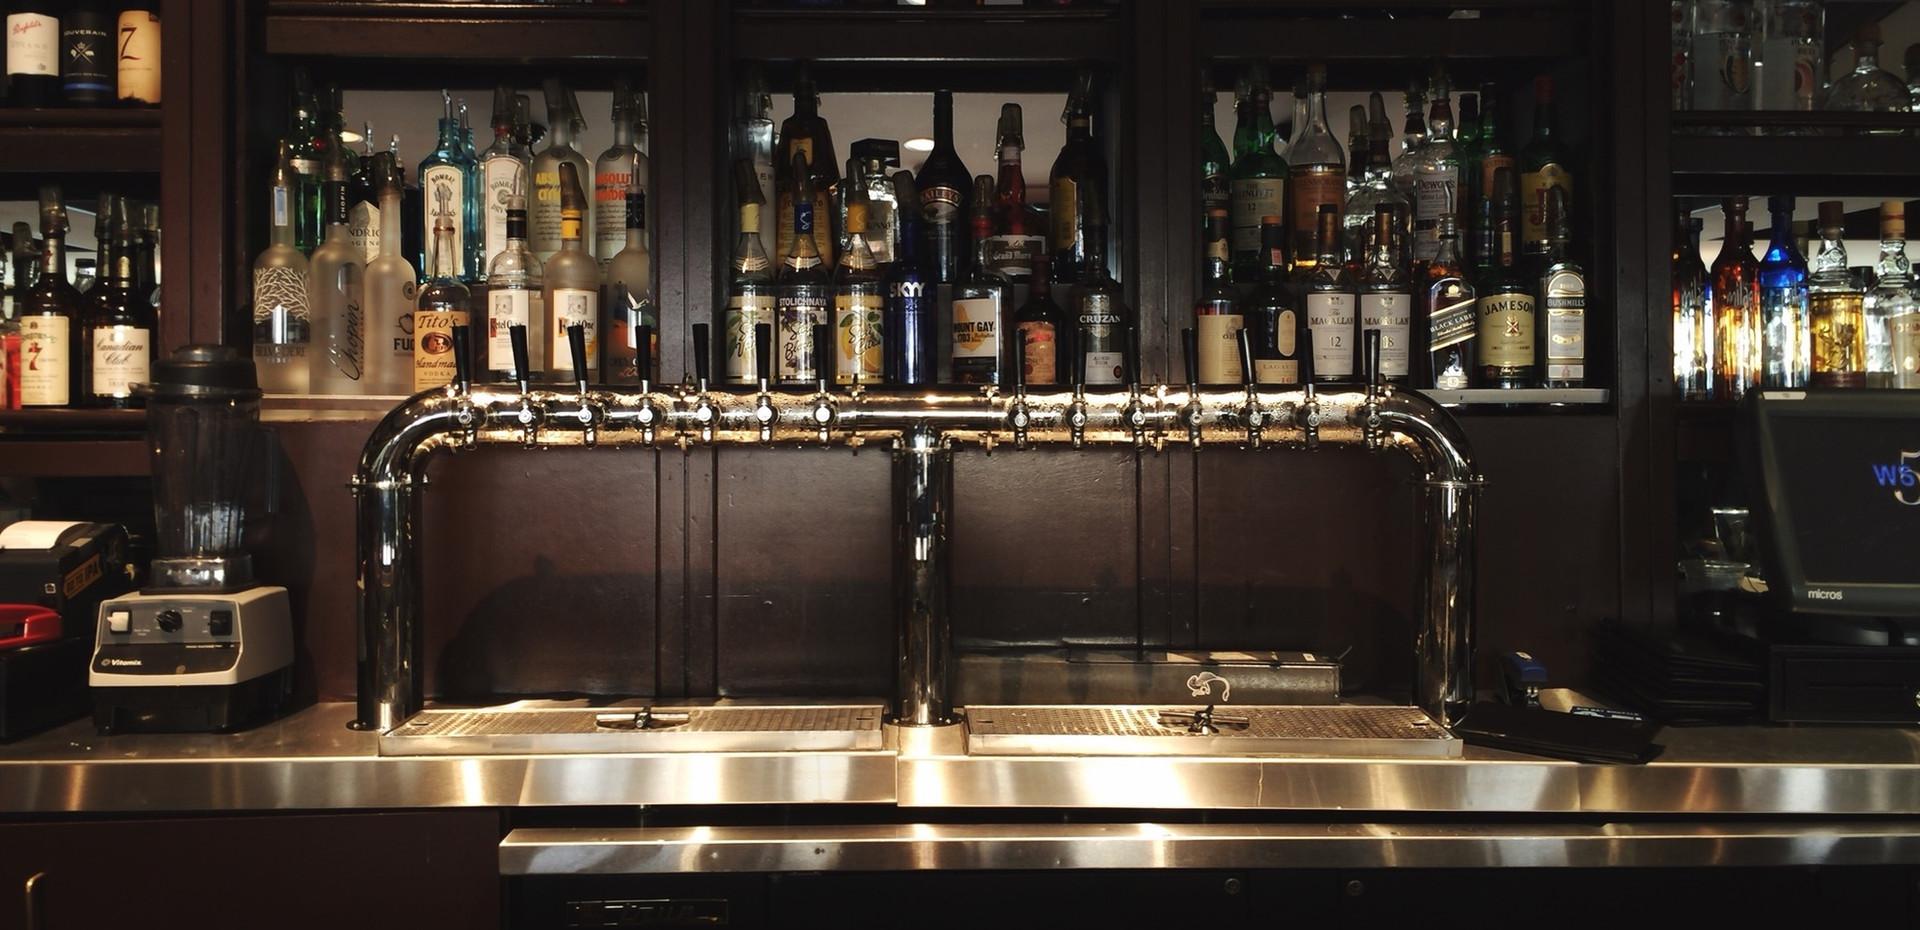 Beverage Management